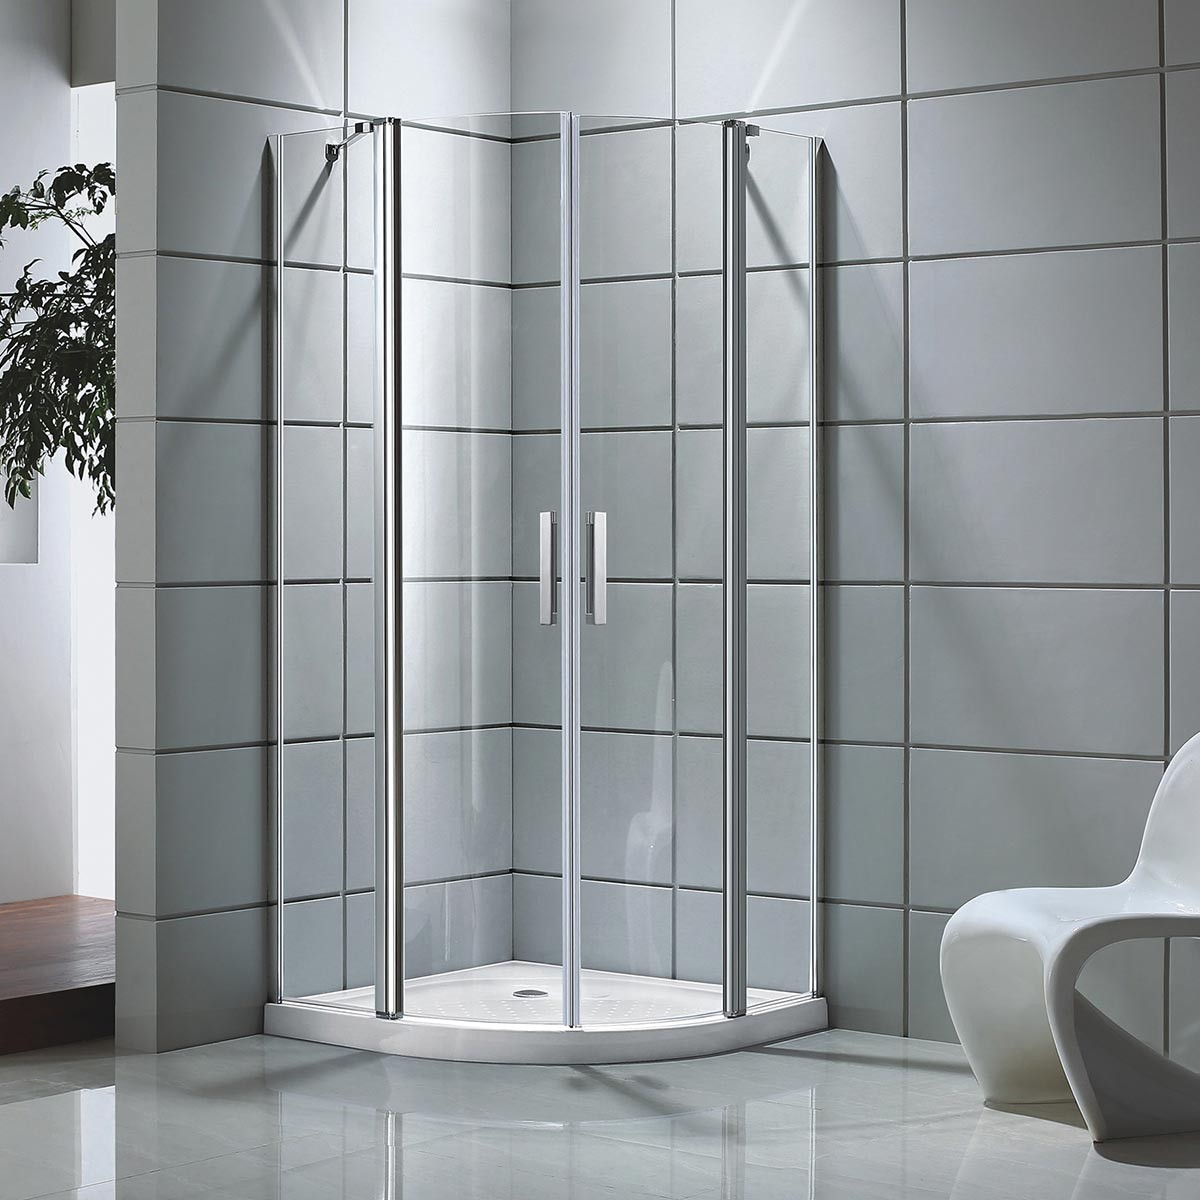 39 x 39 x 75 In. Shower Enclosure (DK-D501-100) | Decoraport USA